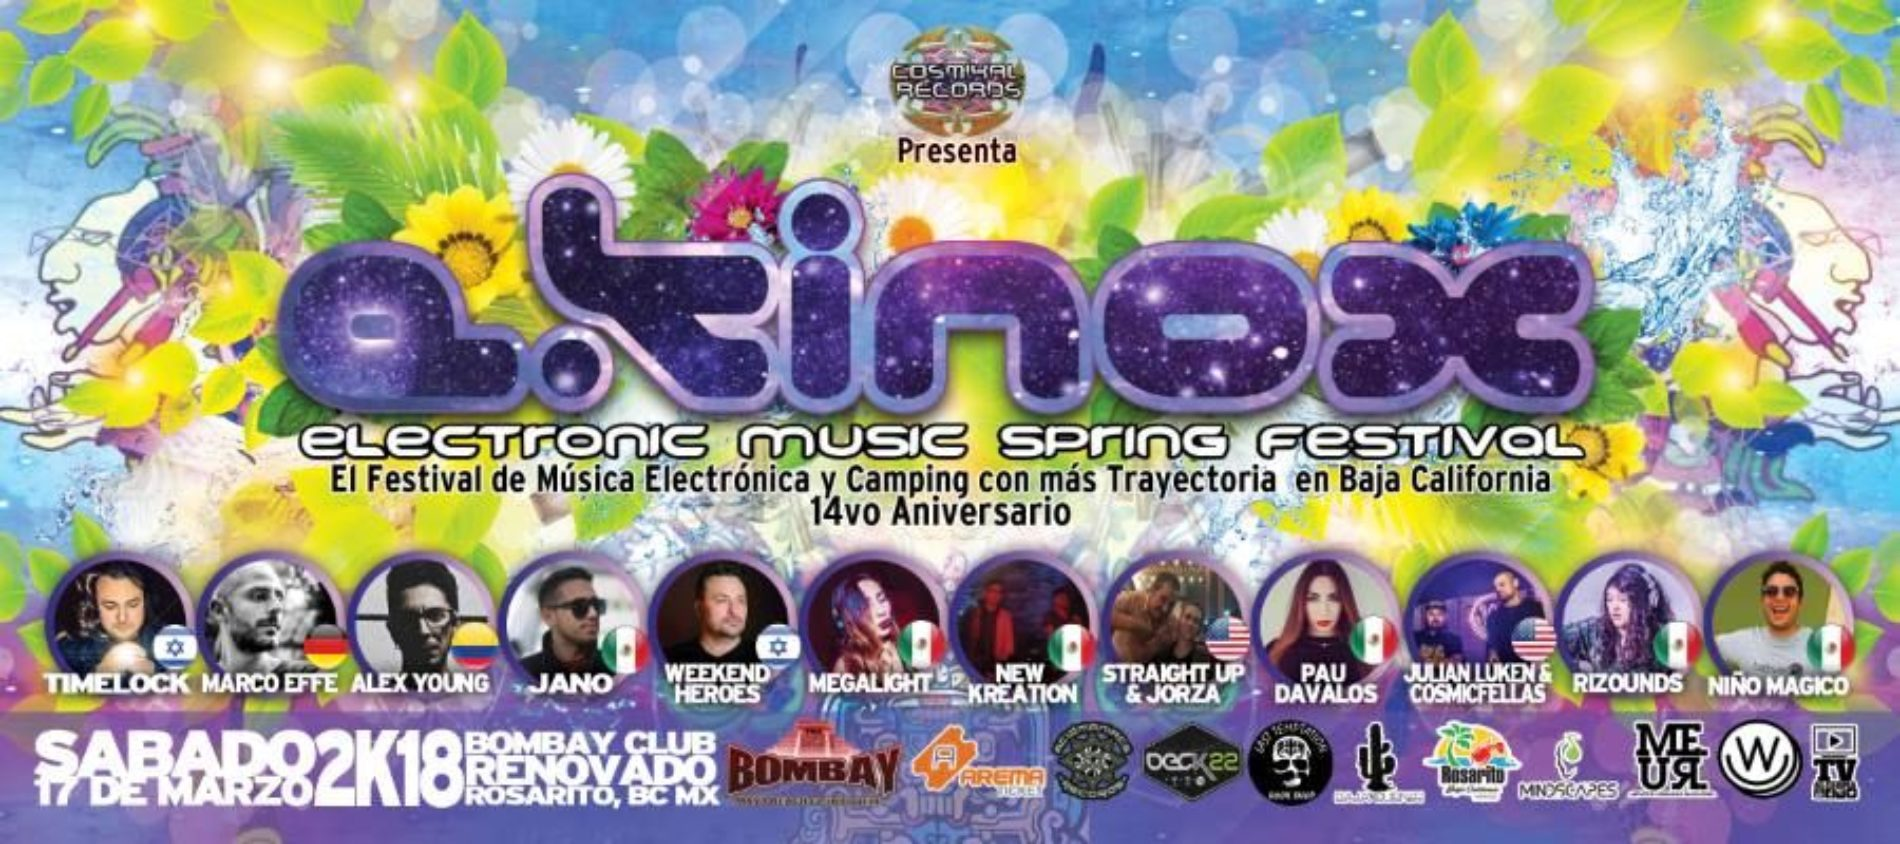 Ekinox Electronic Music Spring Festival 2018